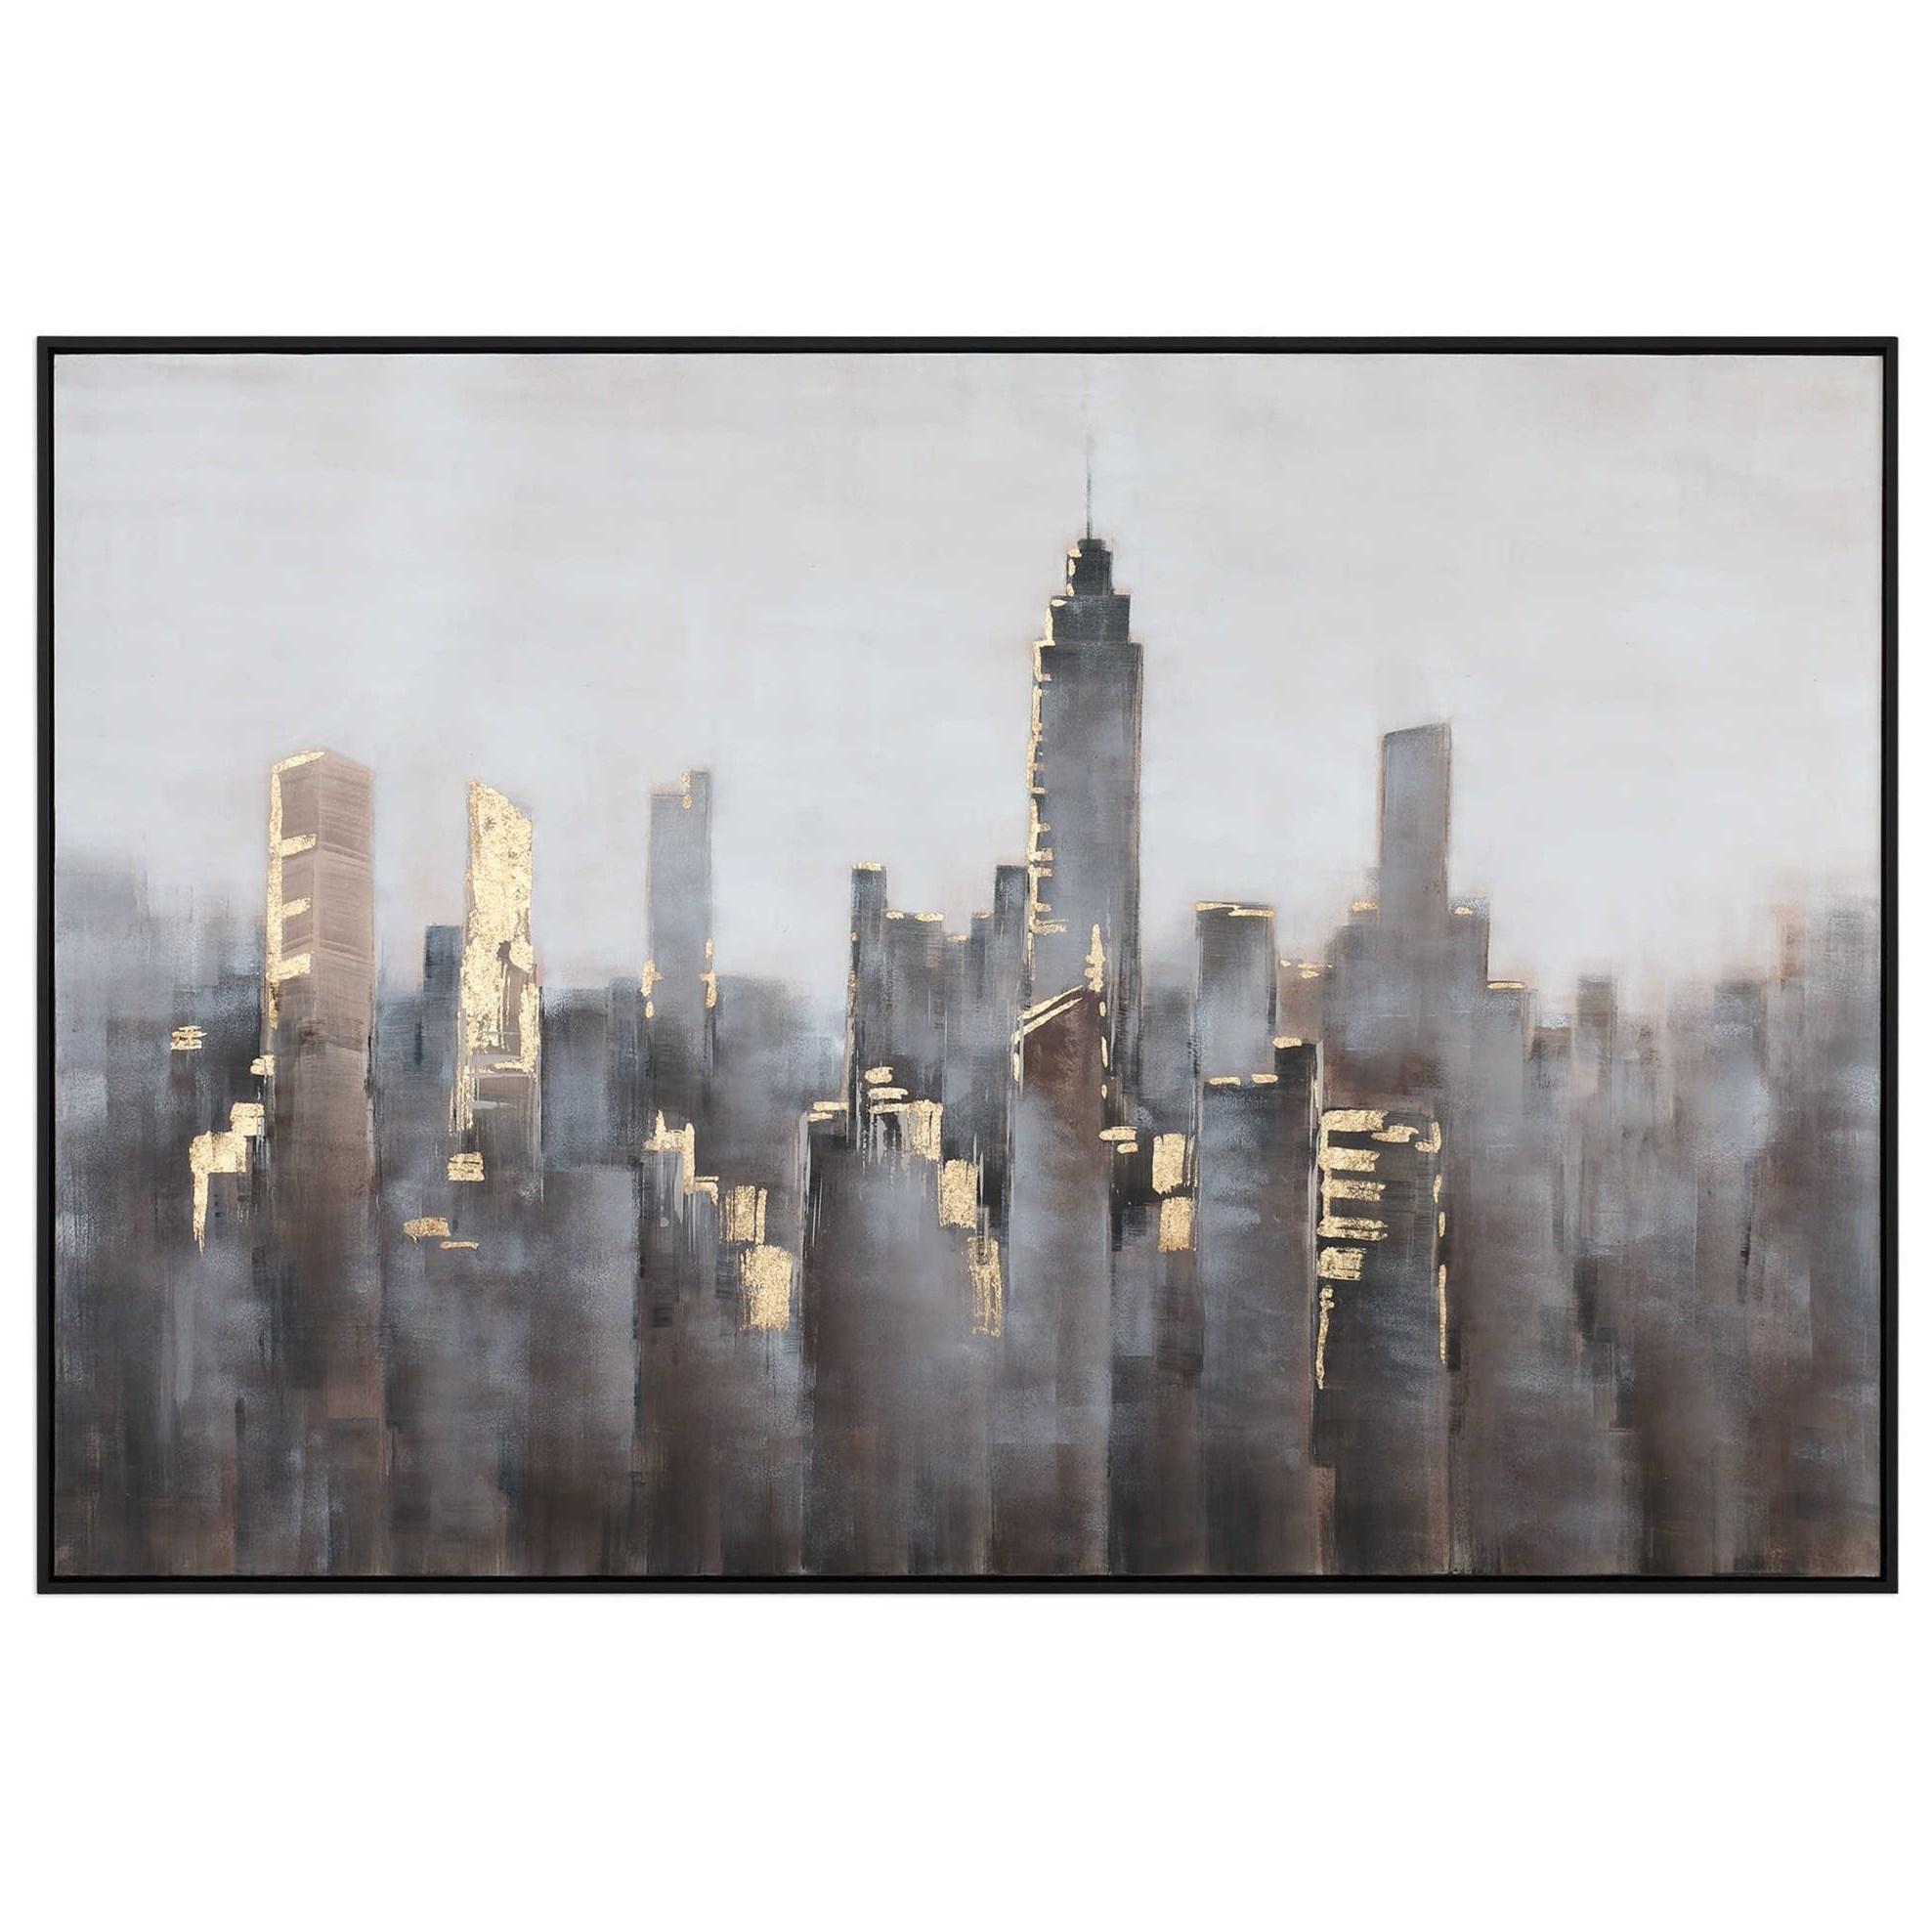 Art Skyline by Uttermost at Wayside Furniture